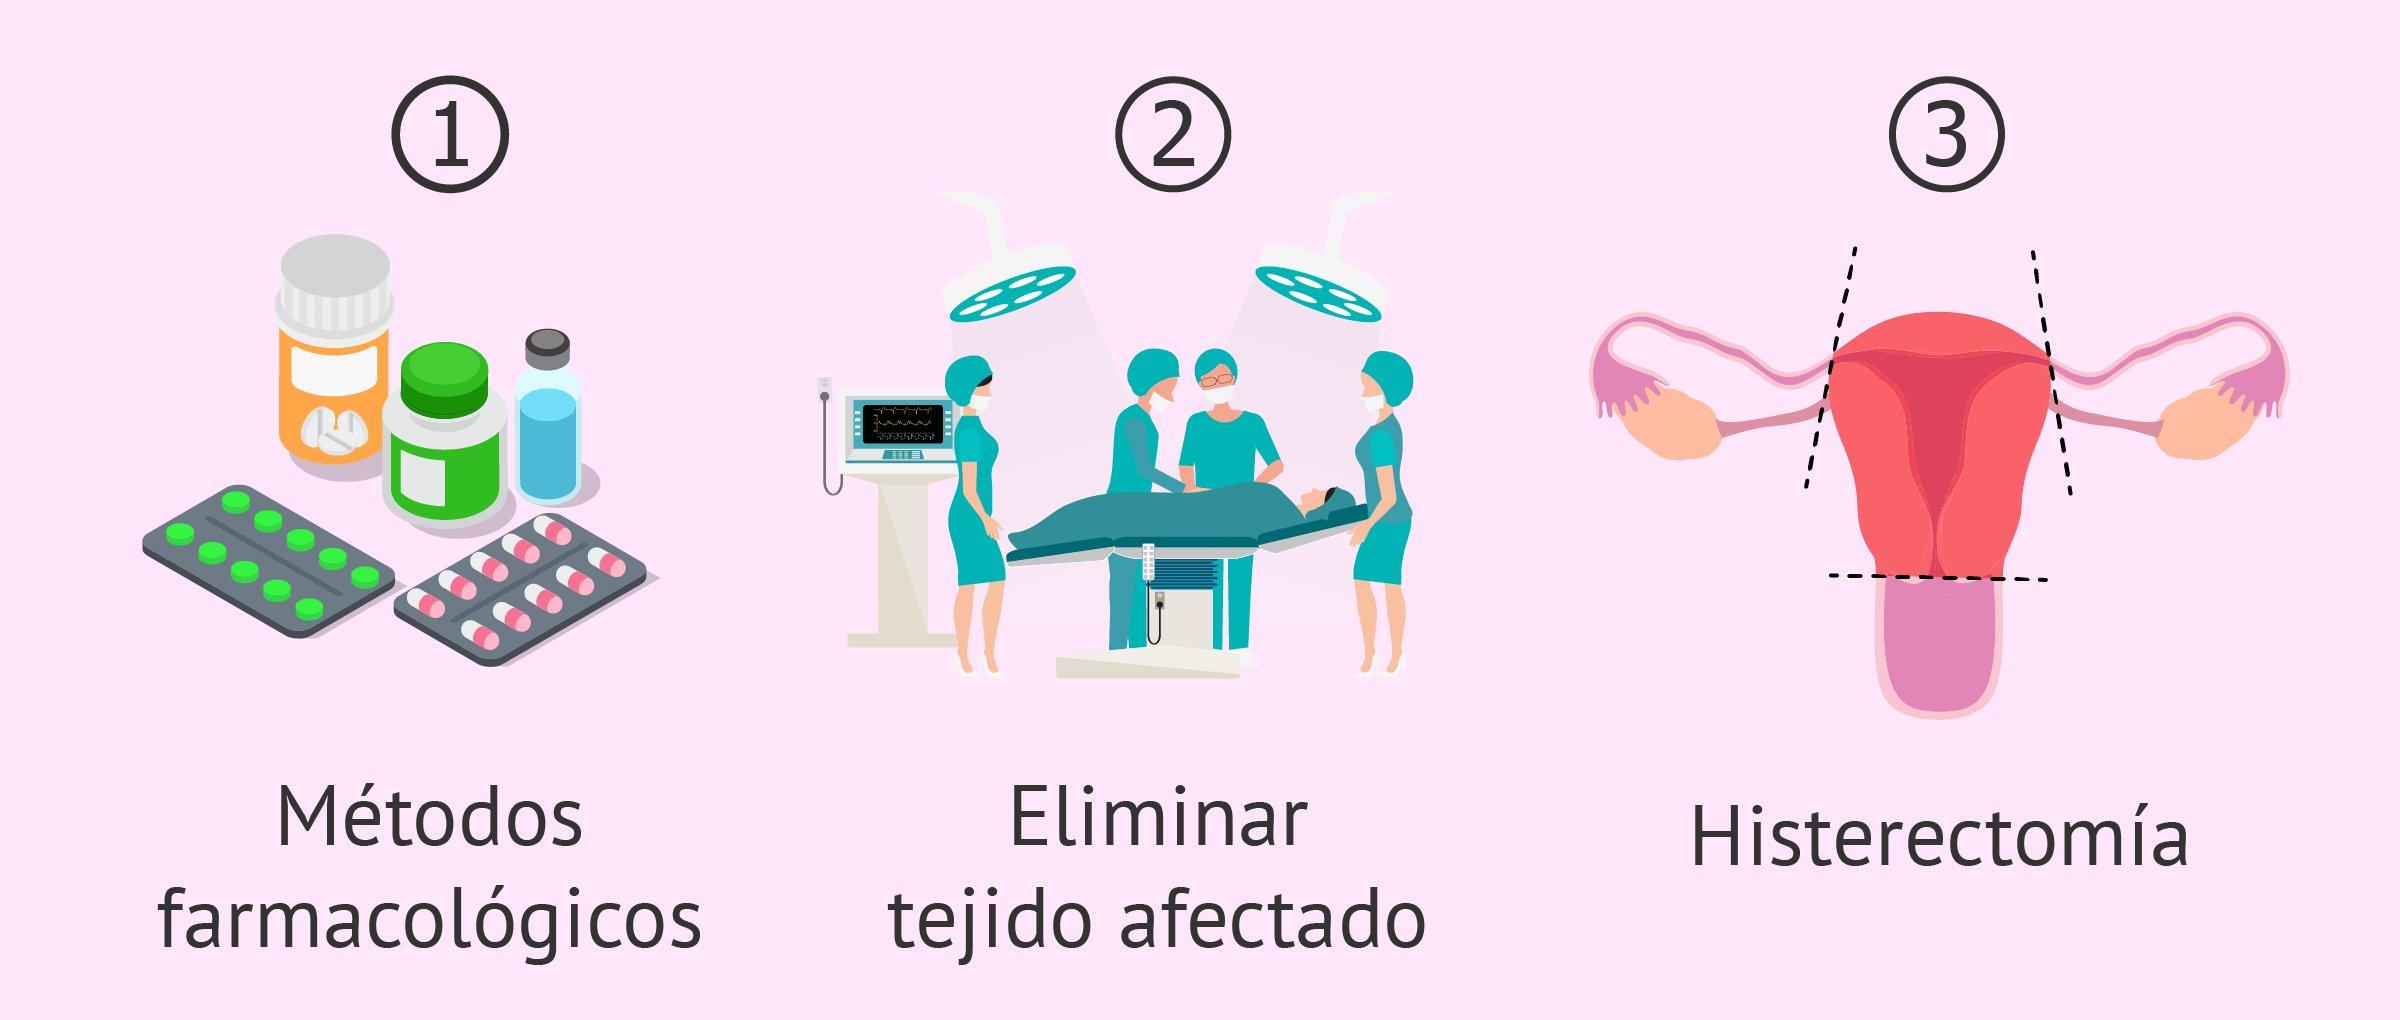 histerectomia total tratamiento hormonal